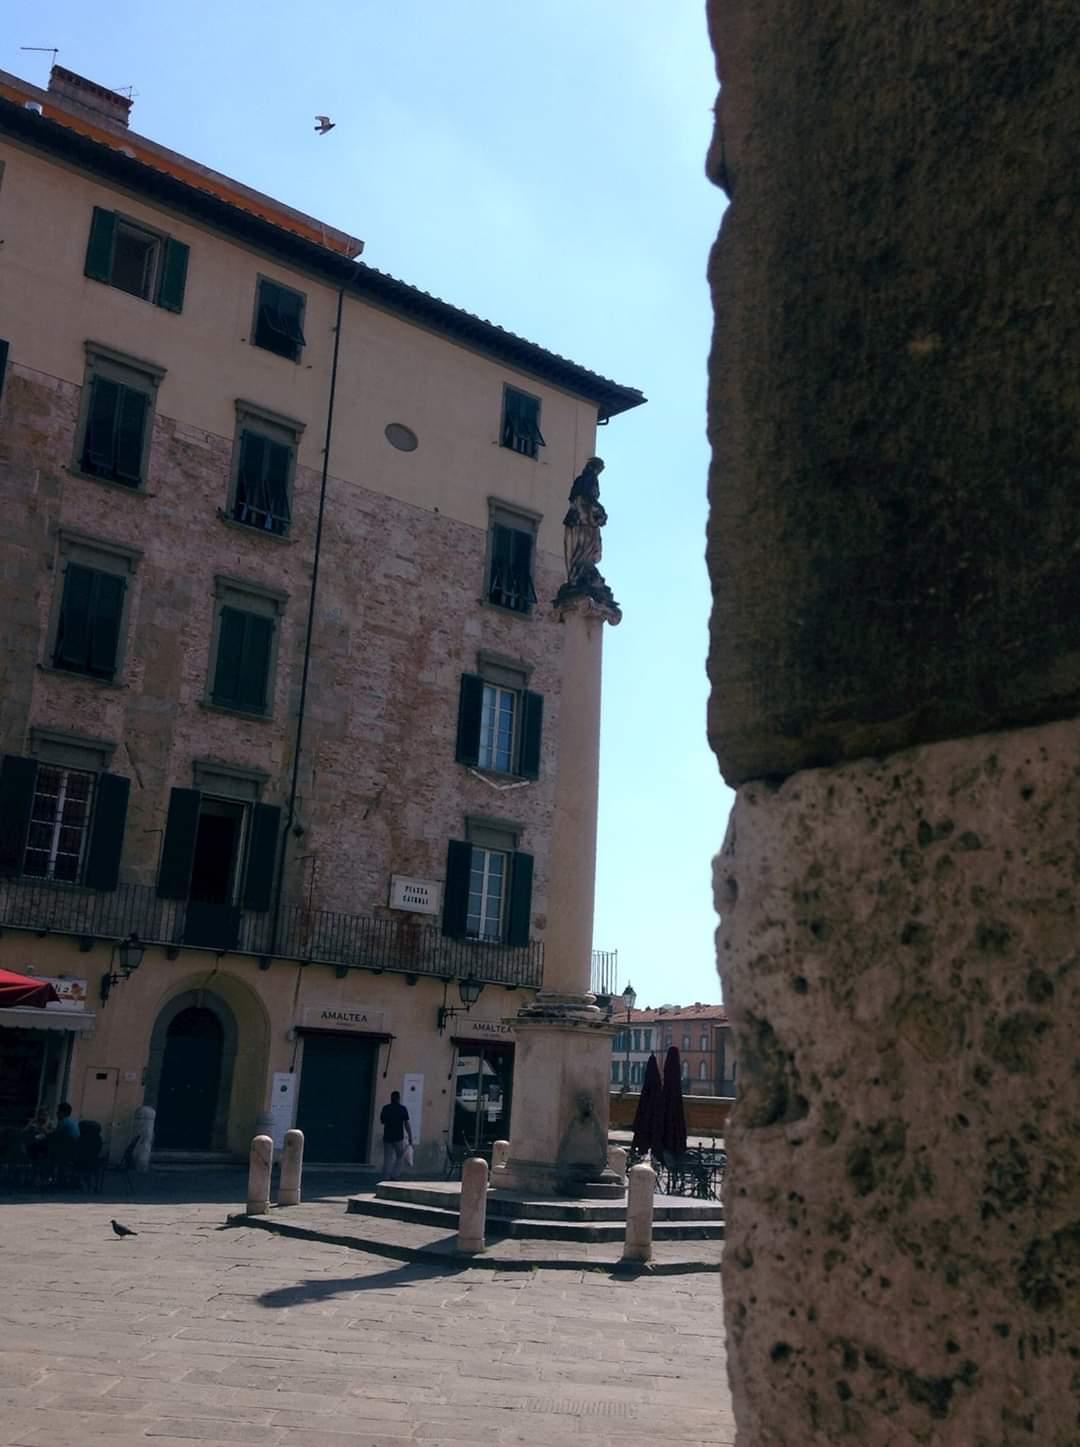 Particolare di Piazza Cairoli a Pisa. Foto Francesca Cinus - Rivelatrice di Comunità